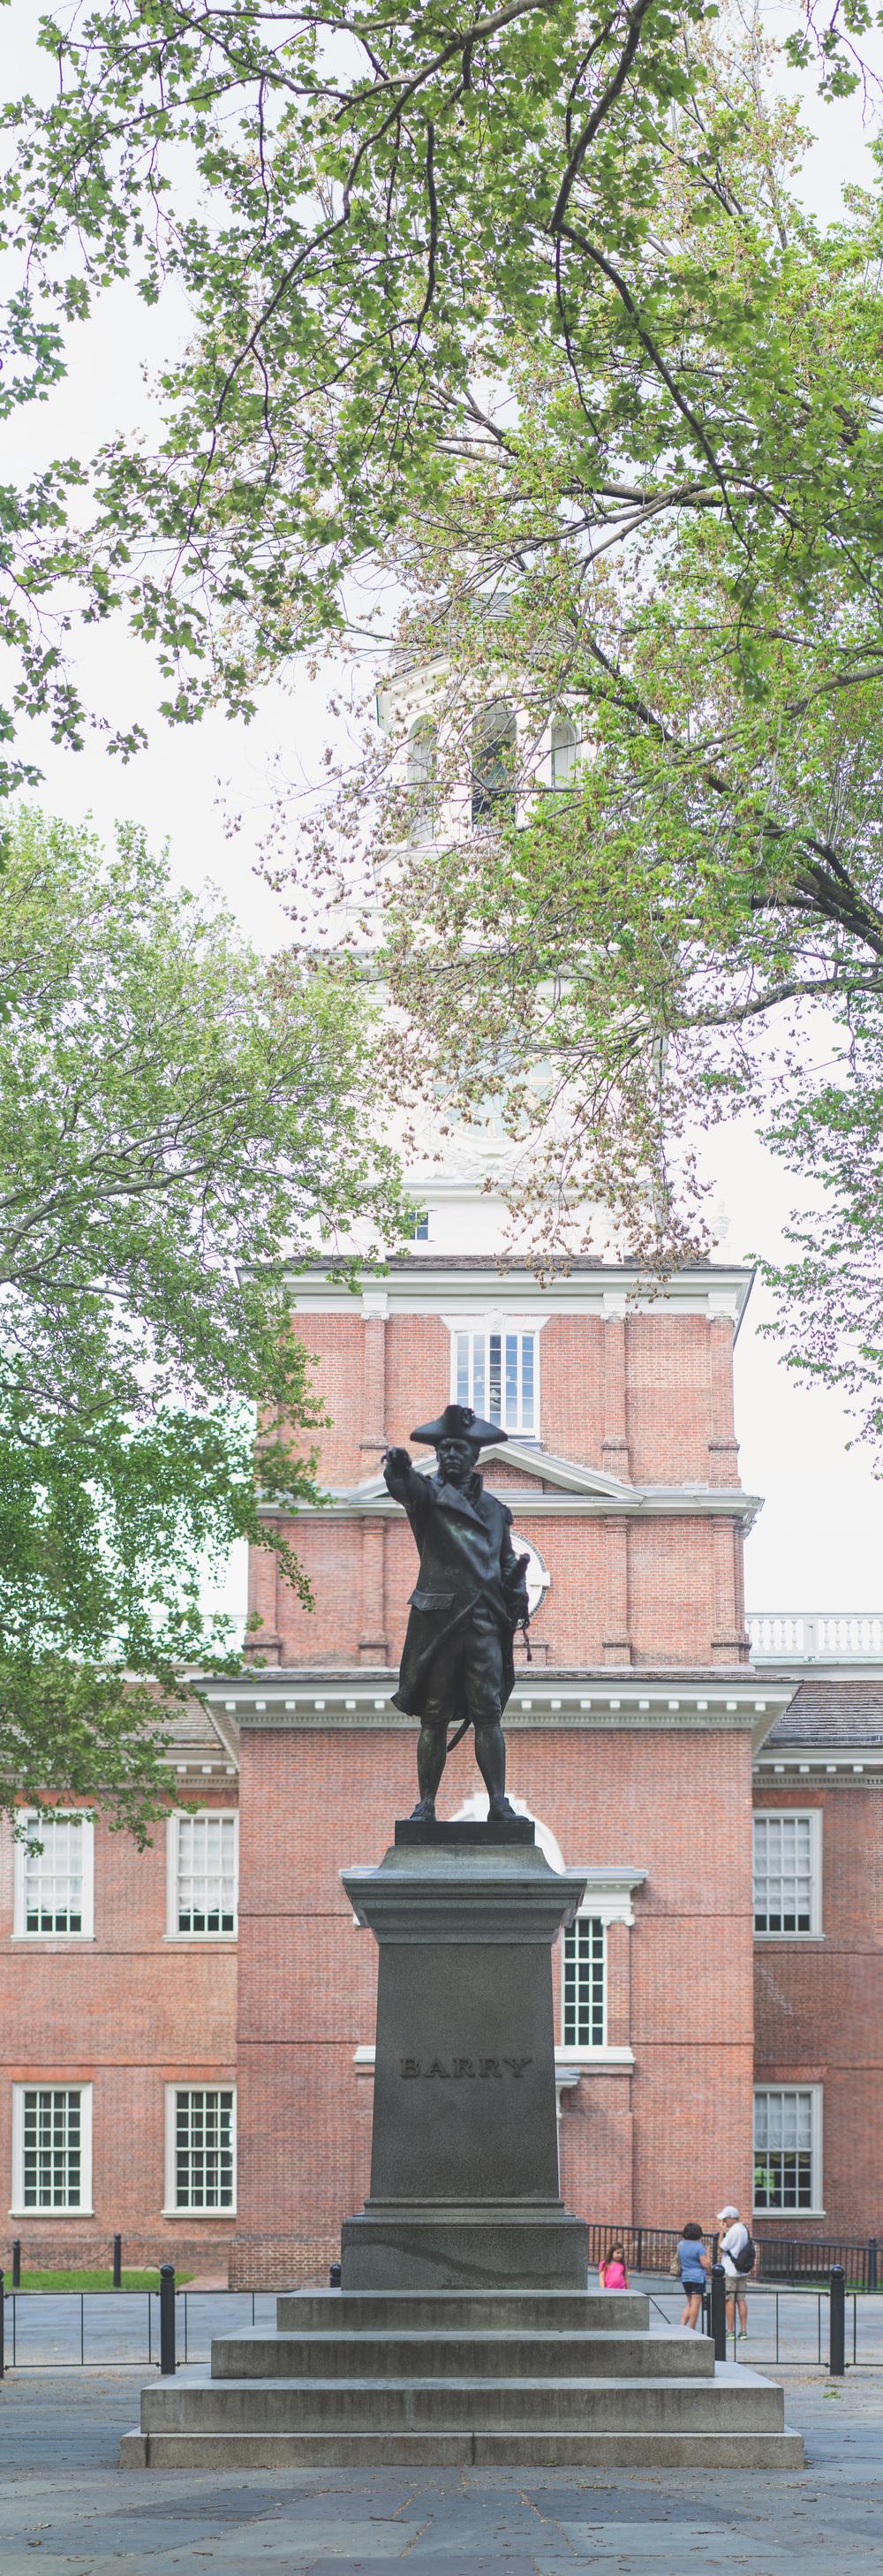 Philadelphia Statue.jpg